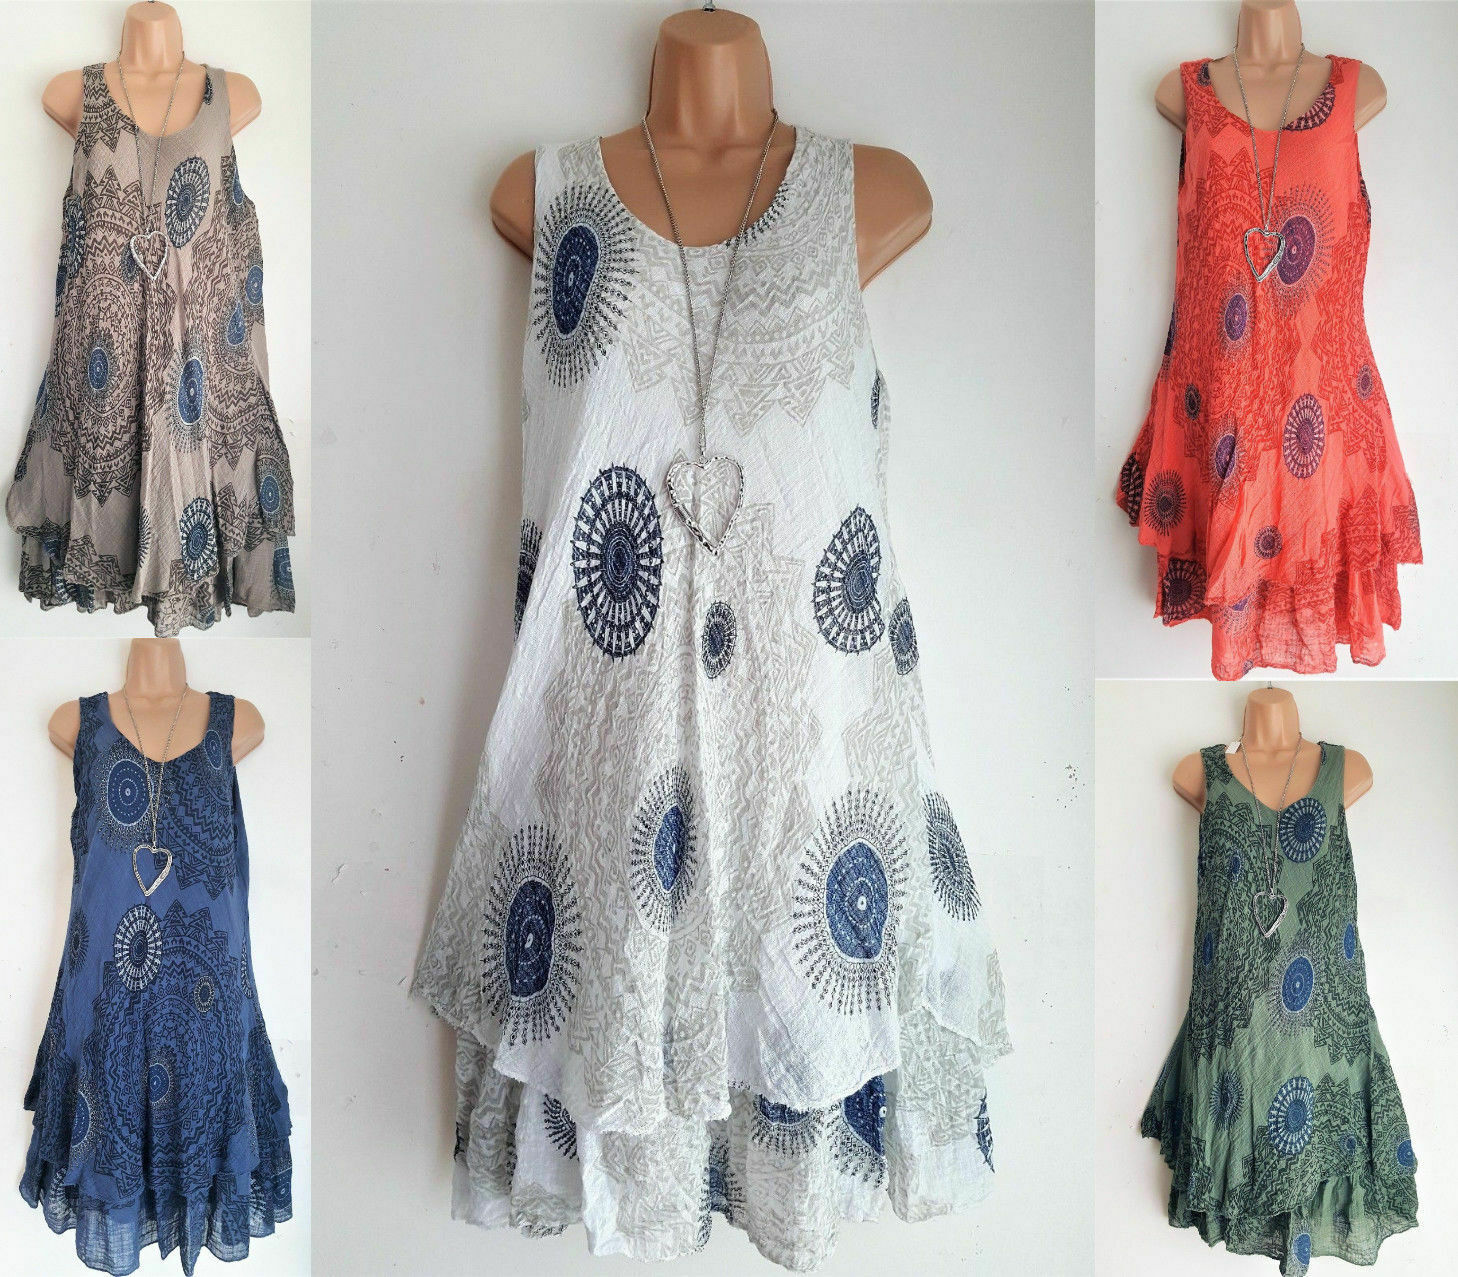 986d79b86ab Womens Summer Boho Printed Sleeveless Dress Loose Mini Shirt Sundress  Casual US